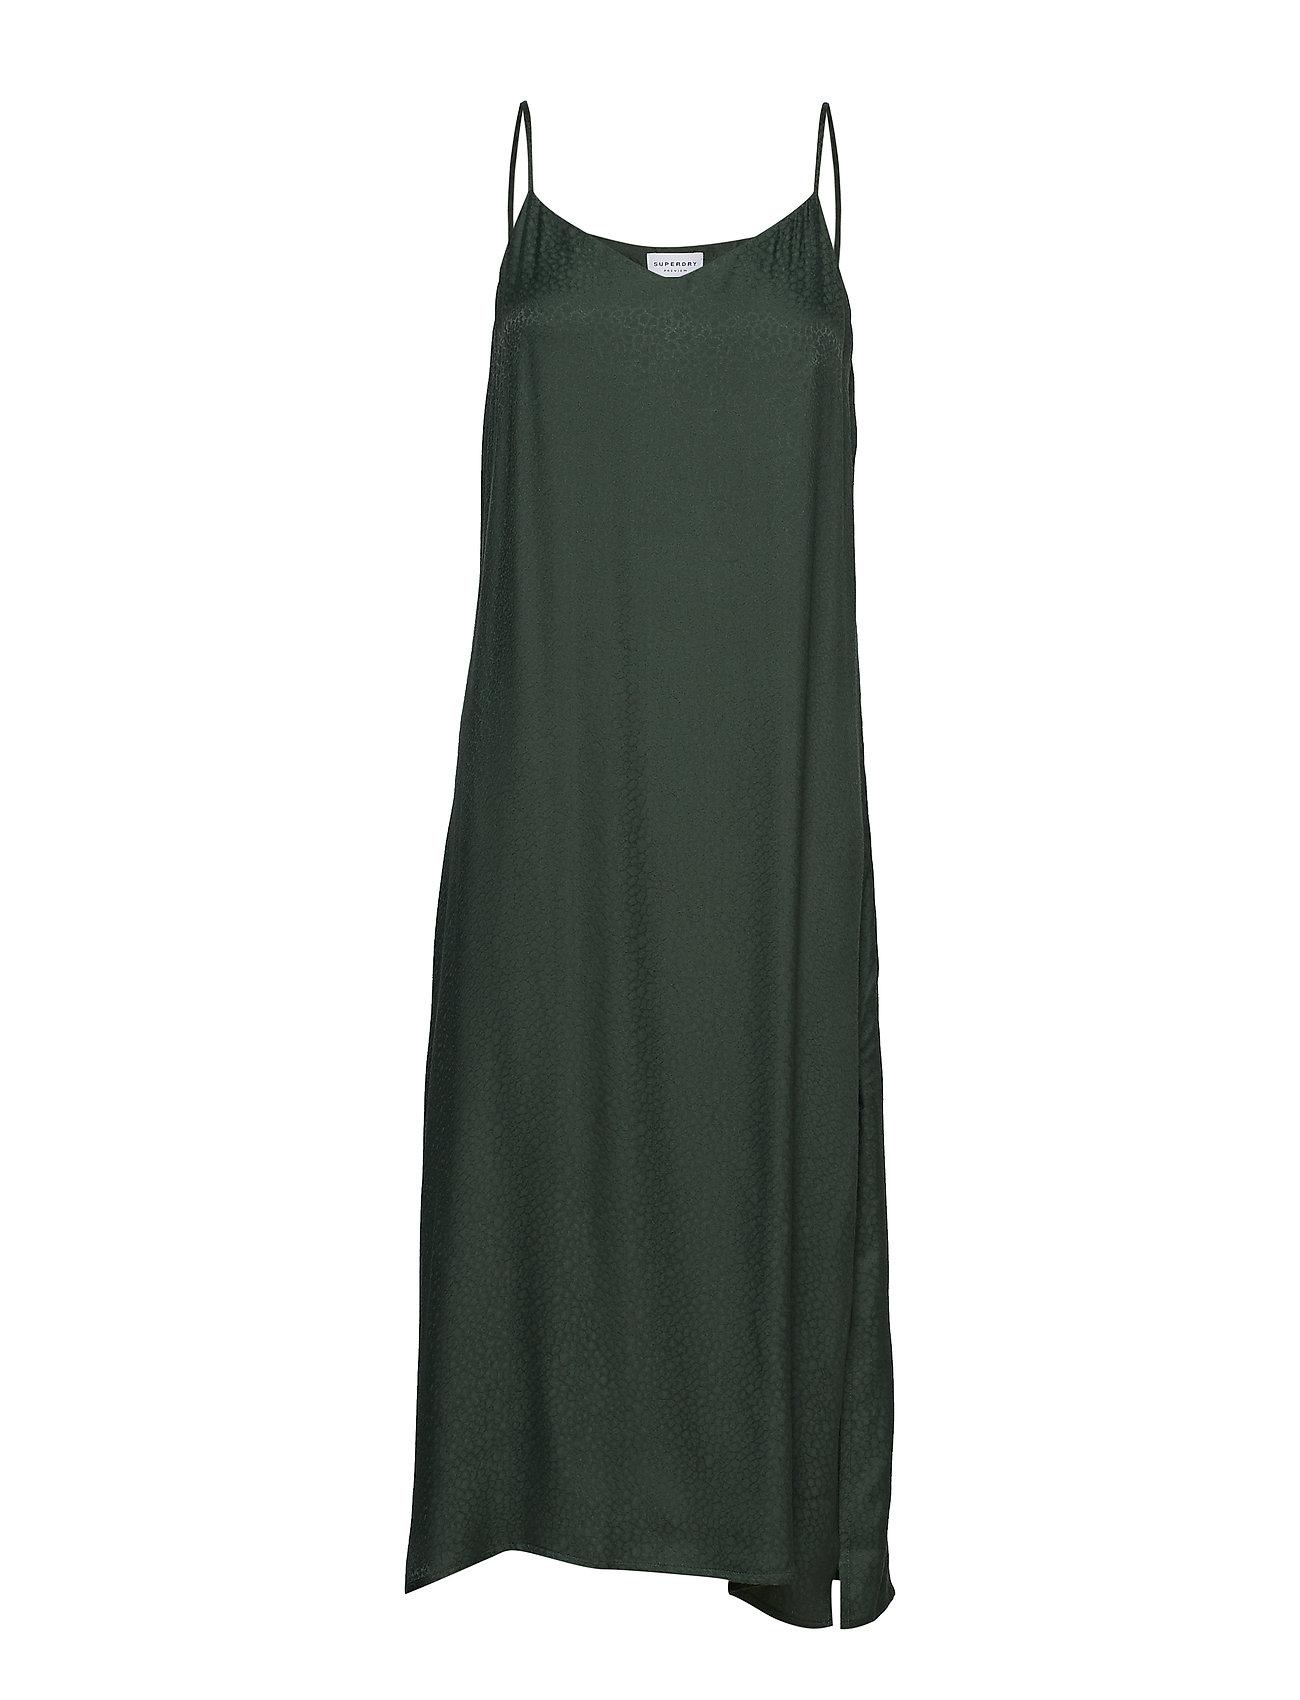 Superdry BIANCA SLIP DRESS - CHIC GREEN